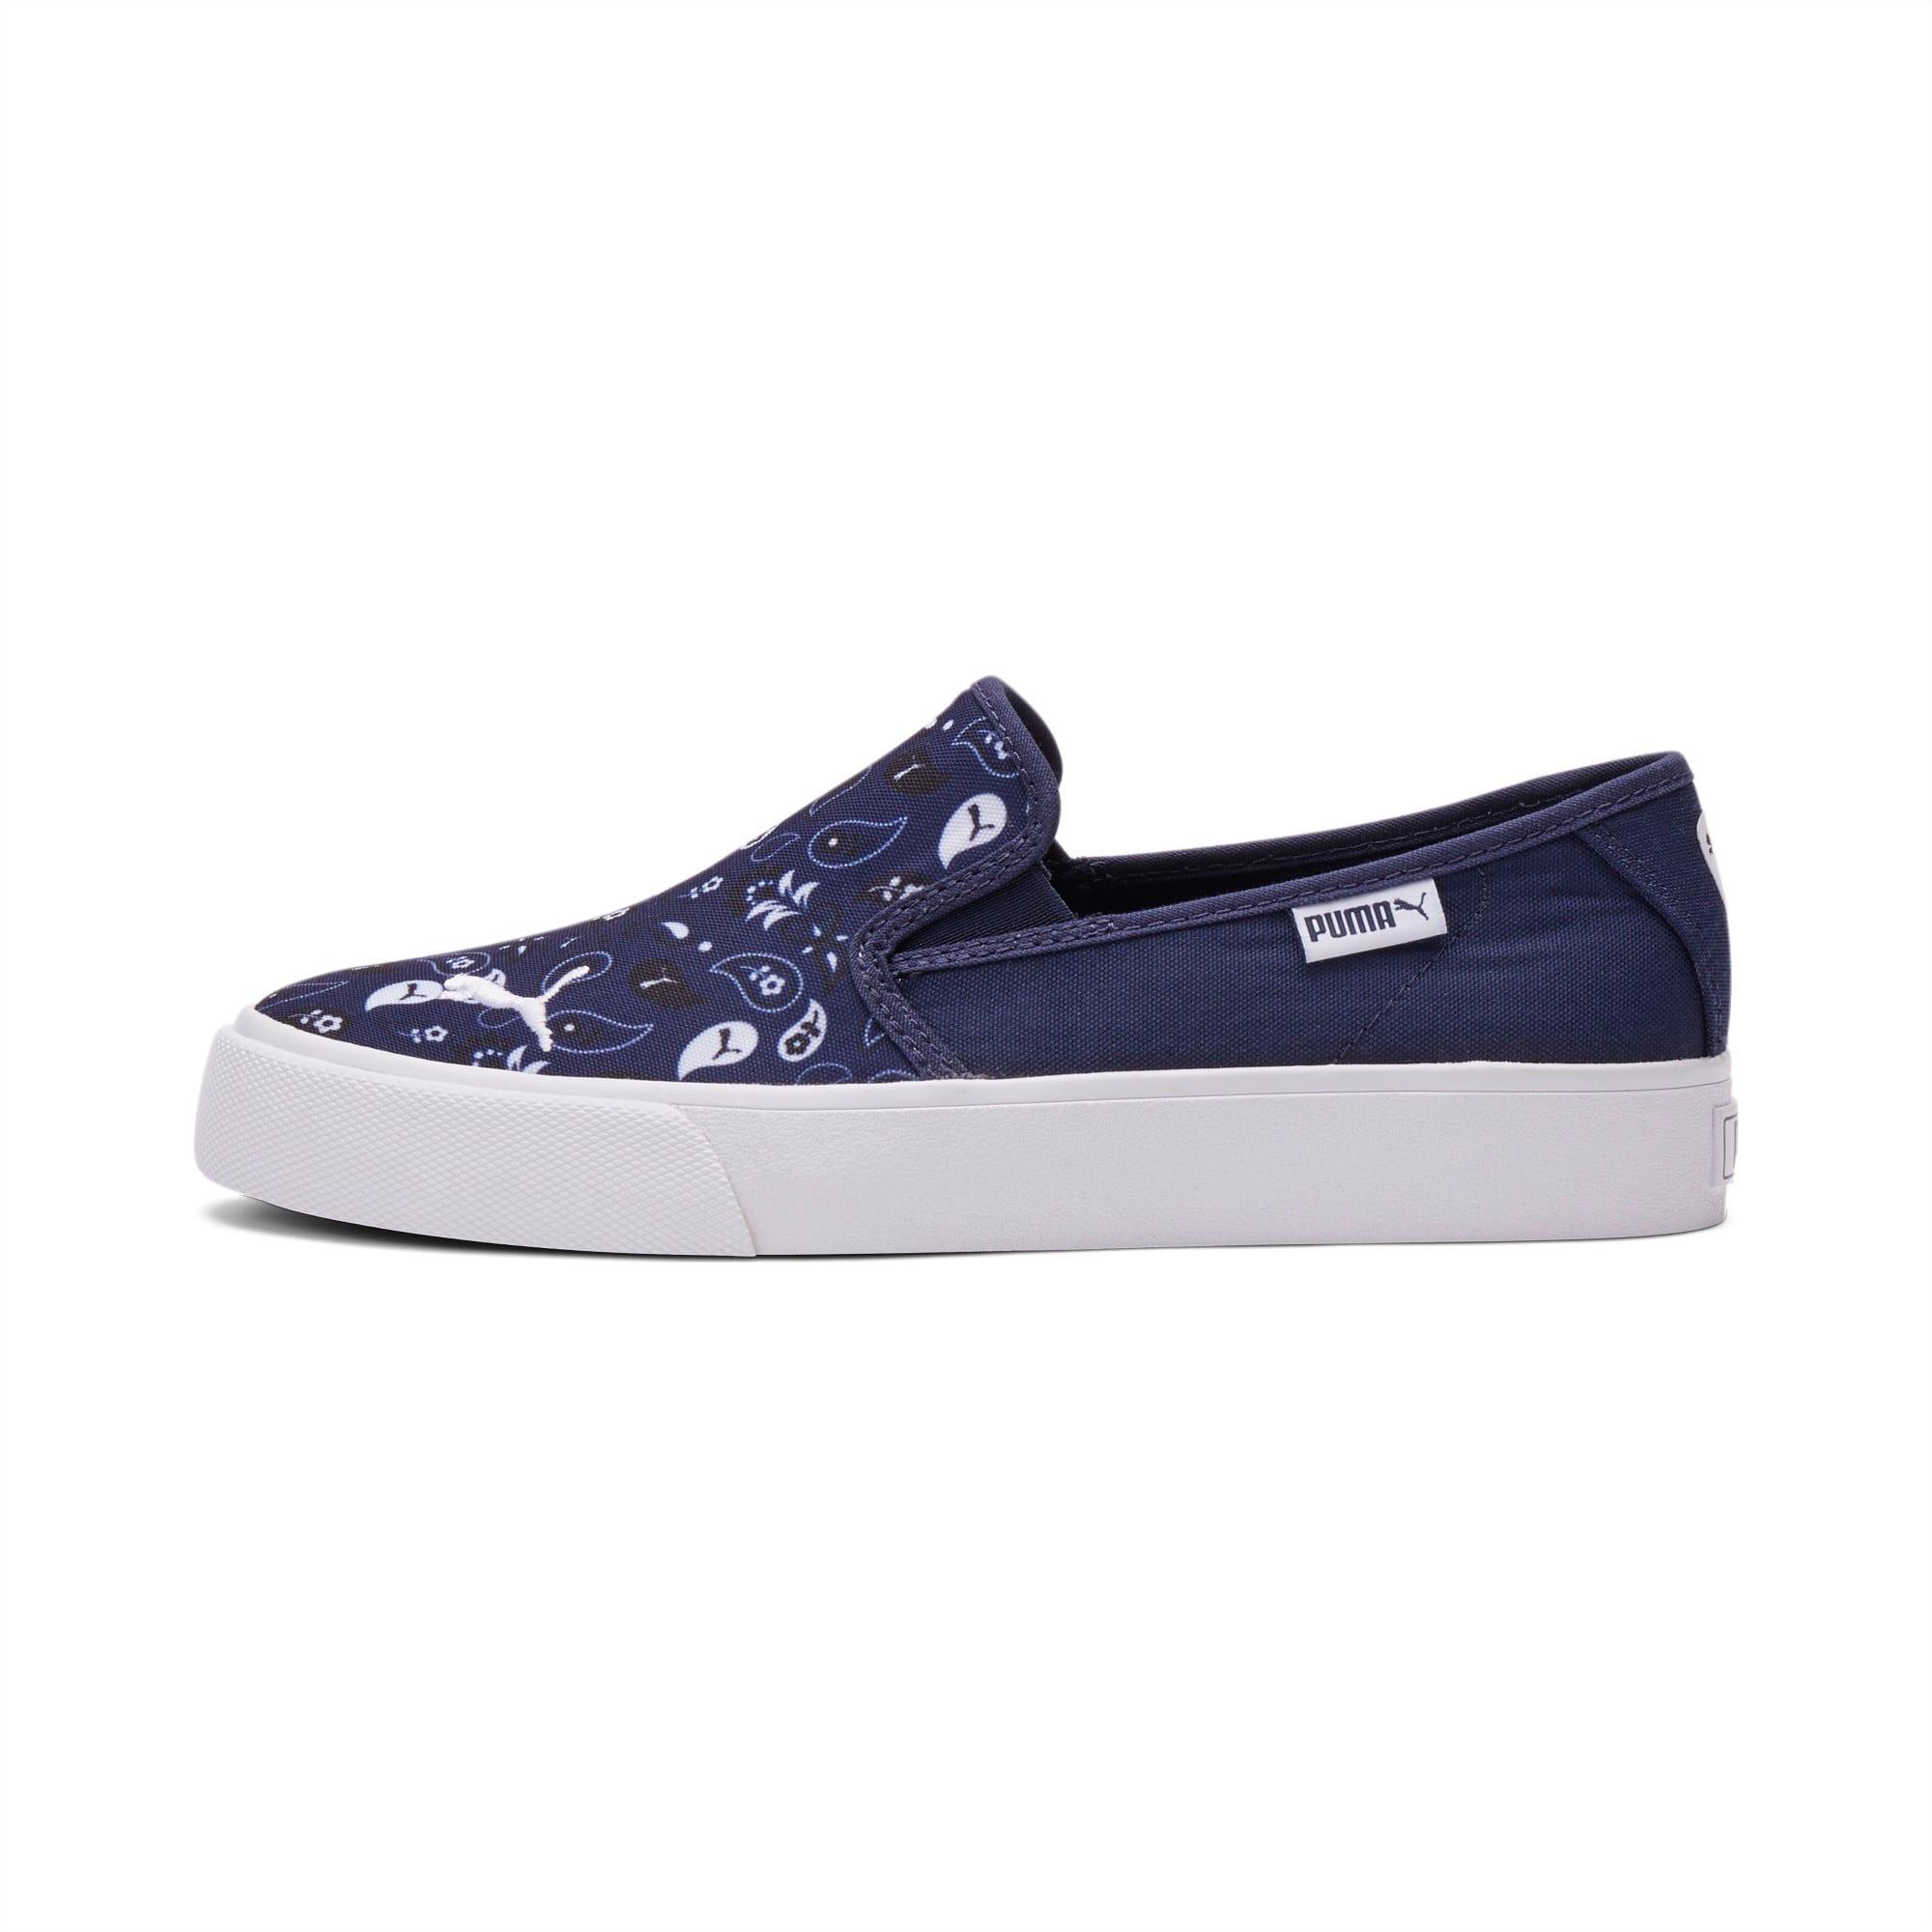 Bari Bandana Wns Women's Slip-On Shoes